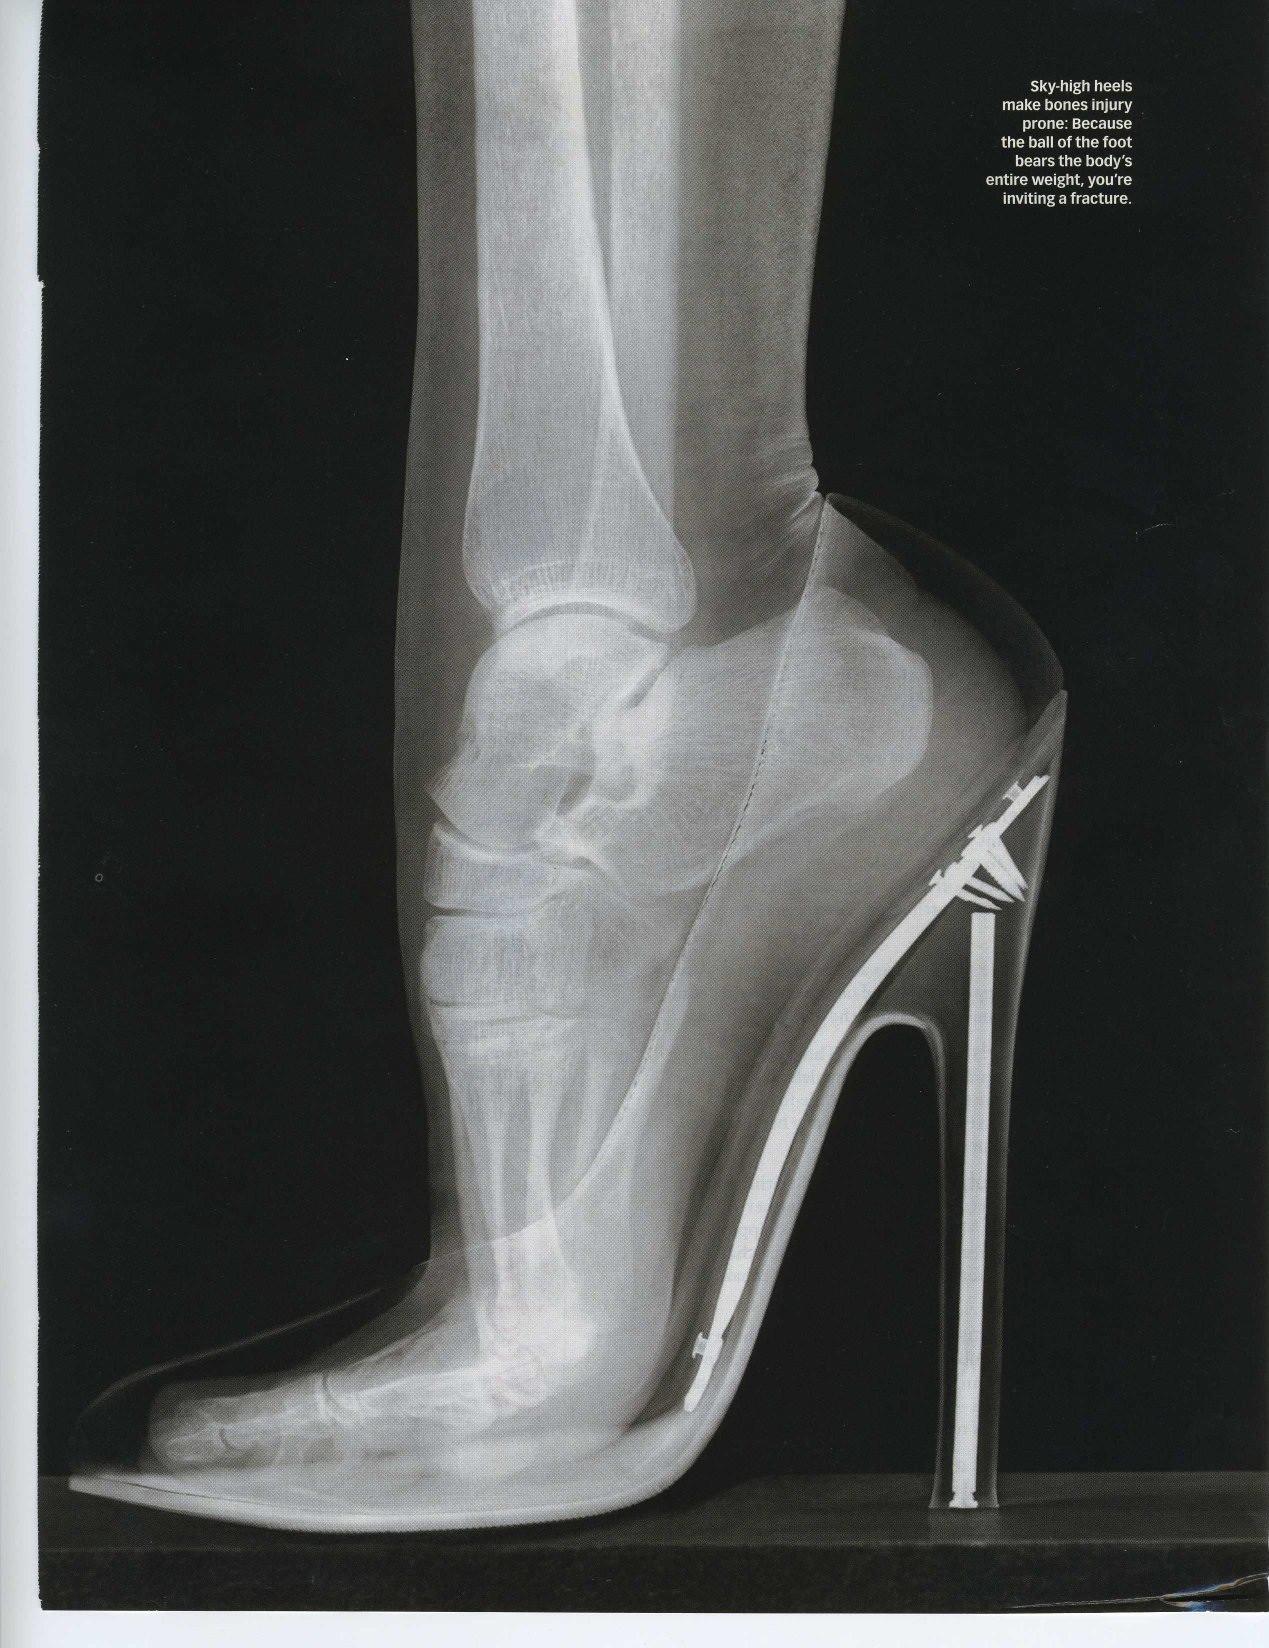 high-heel-trouble